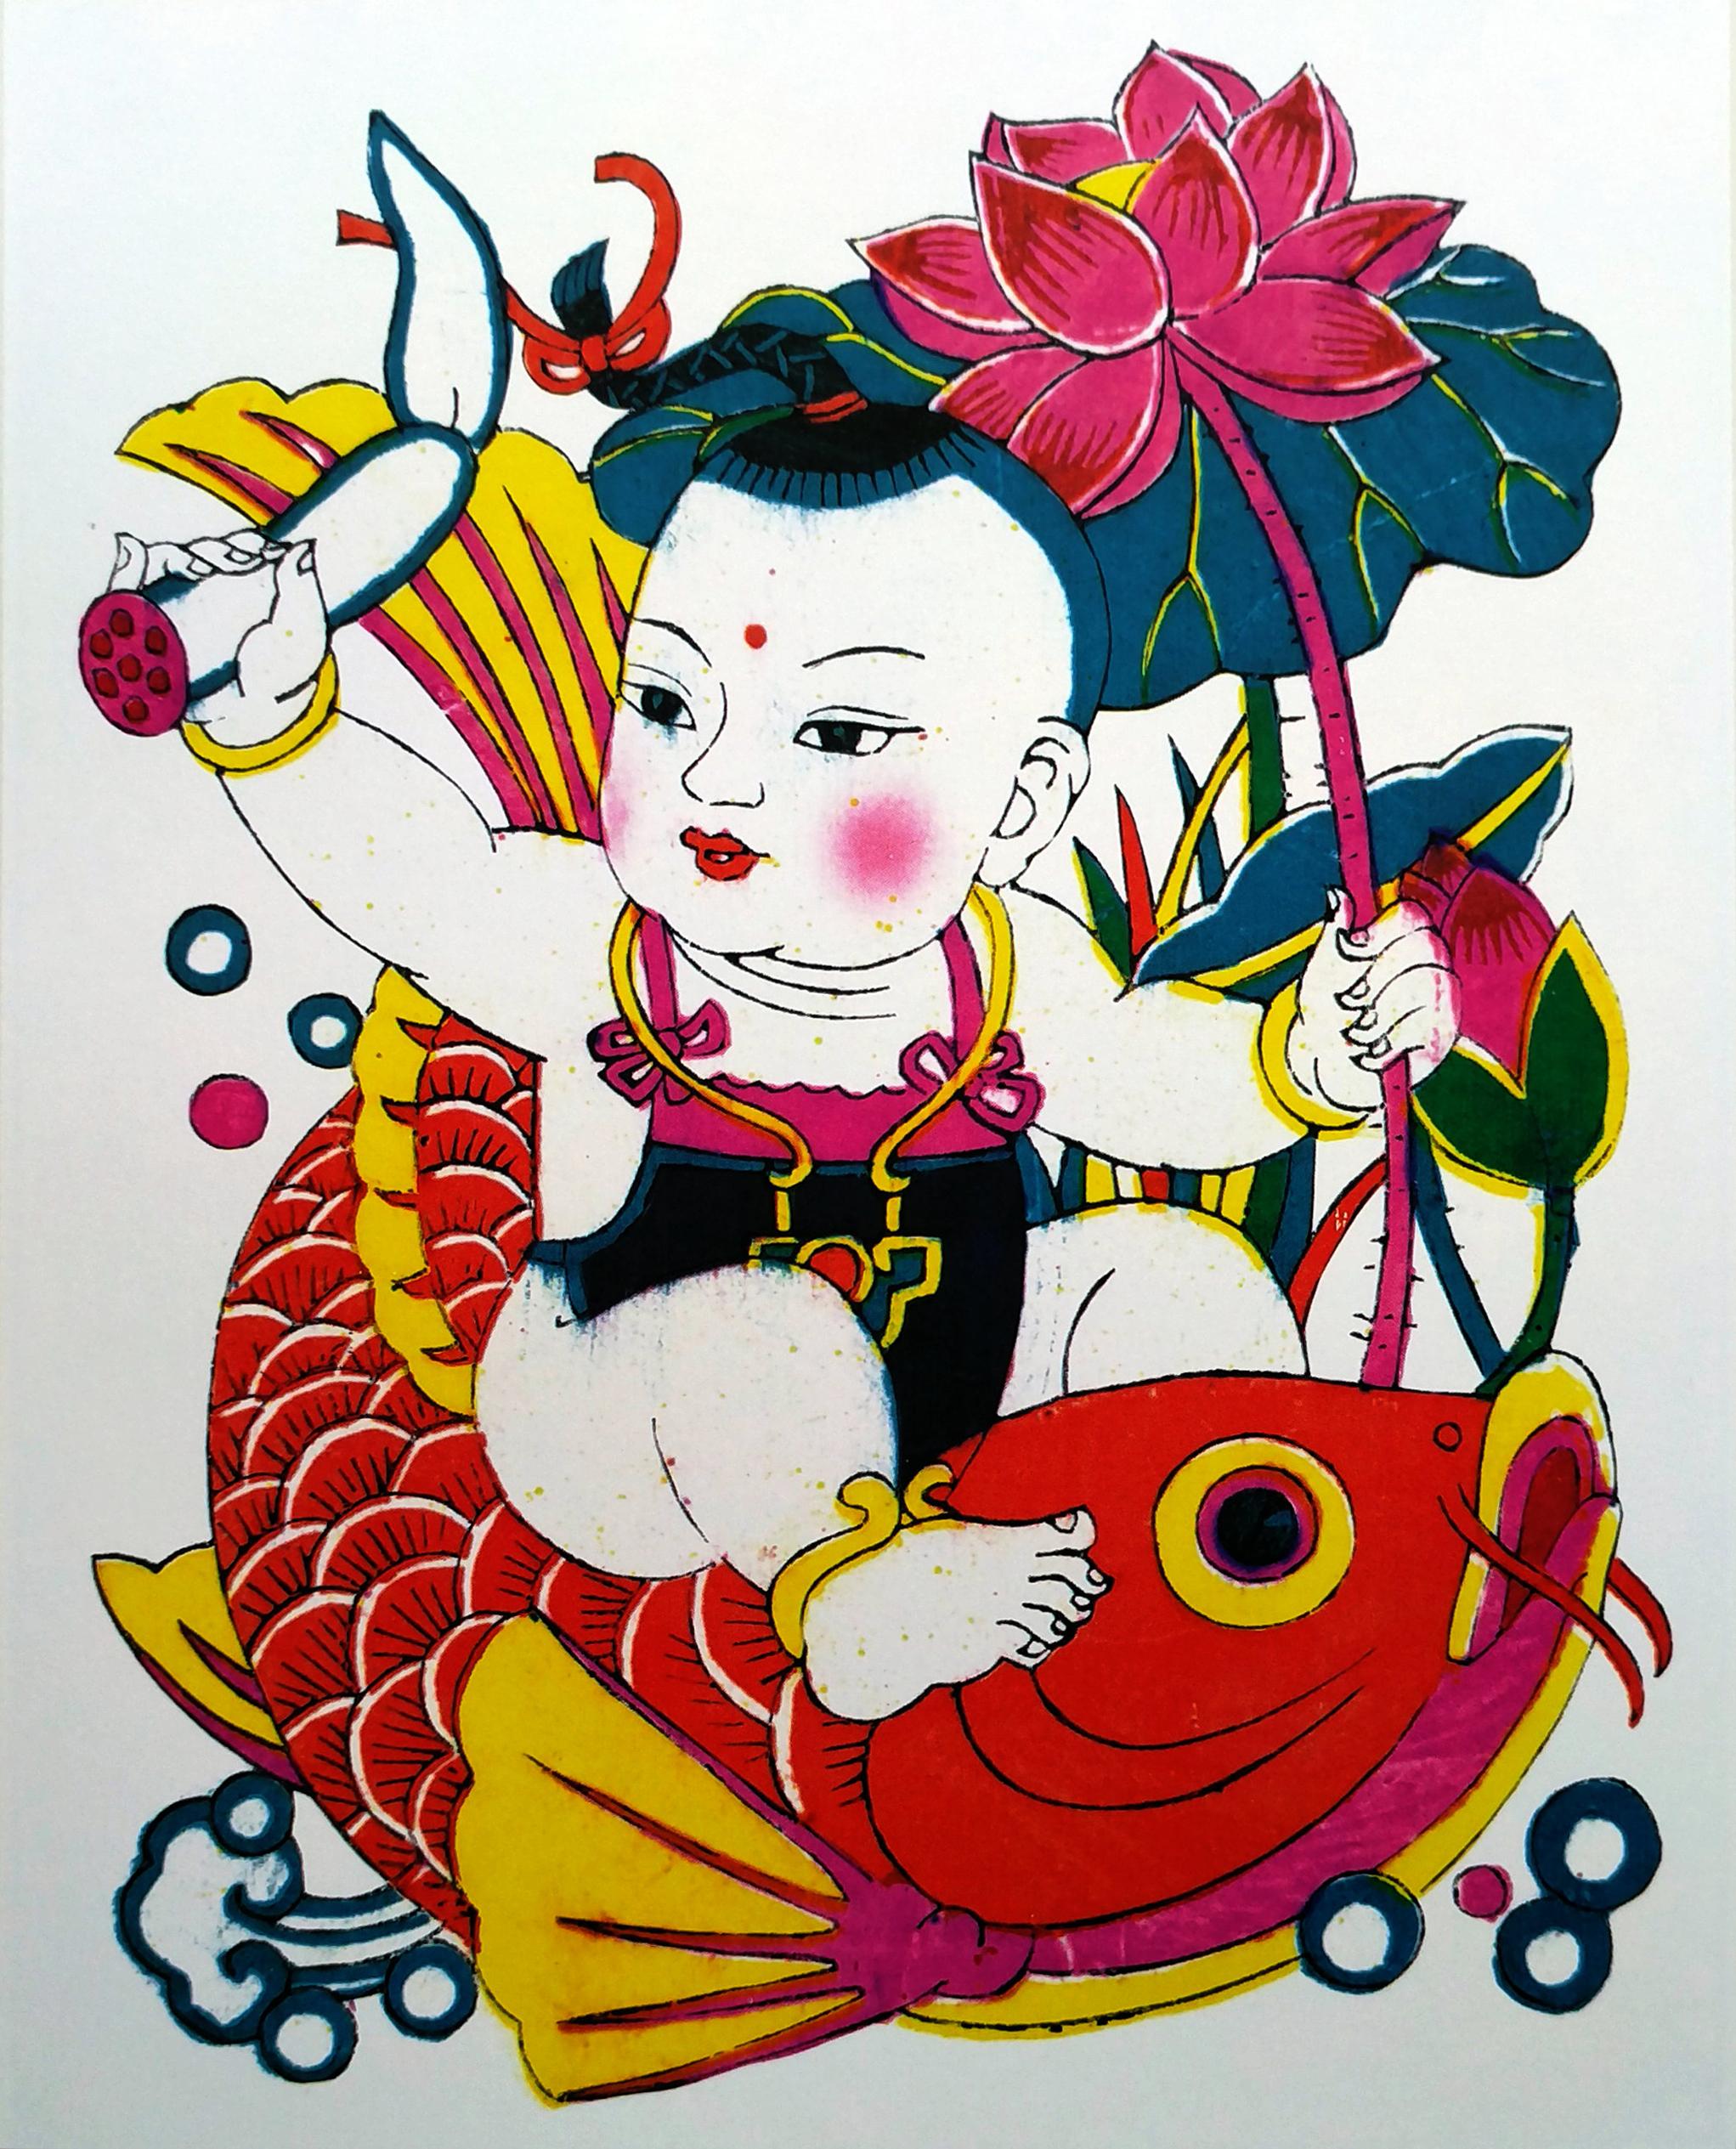 潍坊杨家埠传统年画